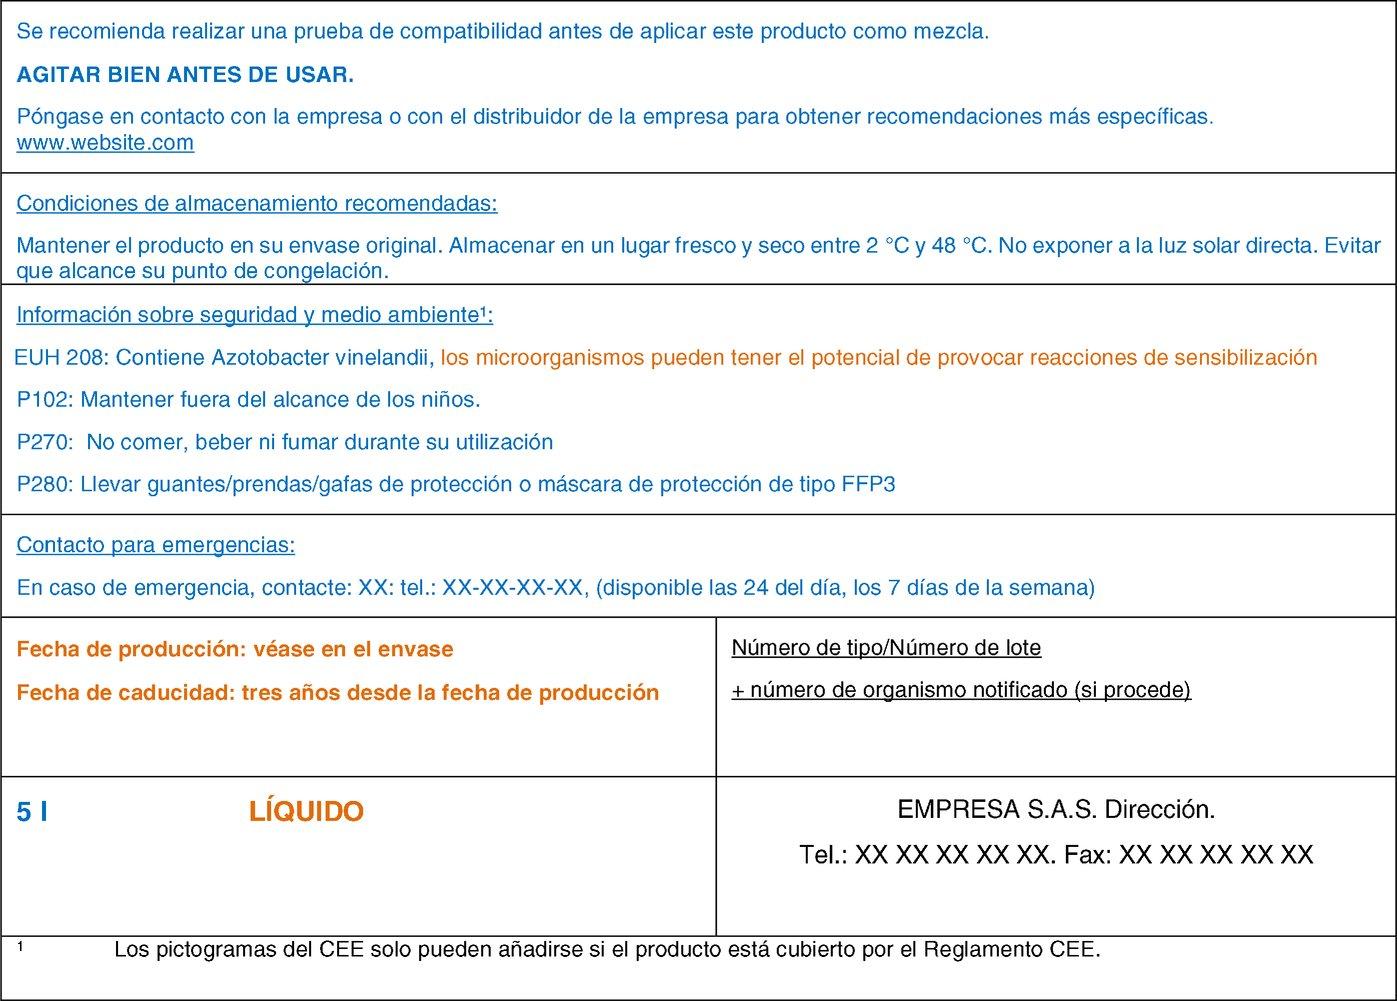 Imagen: http://publications.europa.eu/resource/uriserv/OJ.C_.2021.119.01.0001.01.SPA.xhtml.C_2021119ES.01003501.tif.jpg